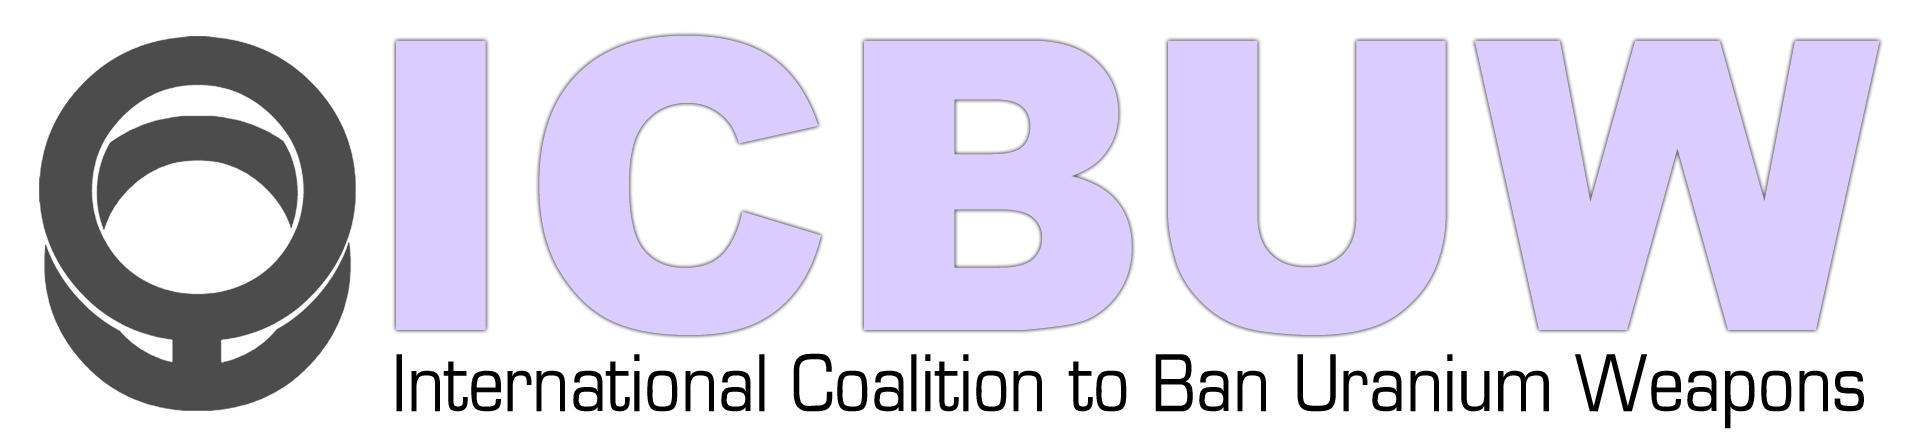 logo for International Coalition to Ban Uranium Weapons